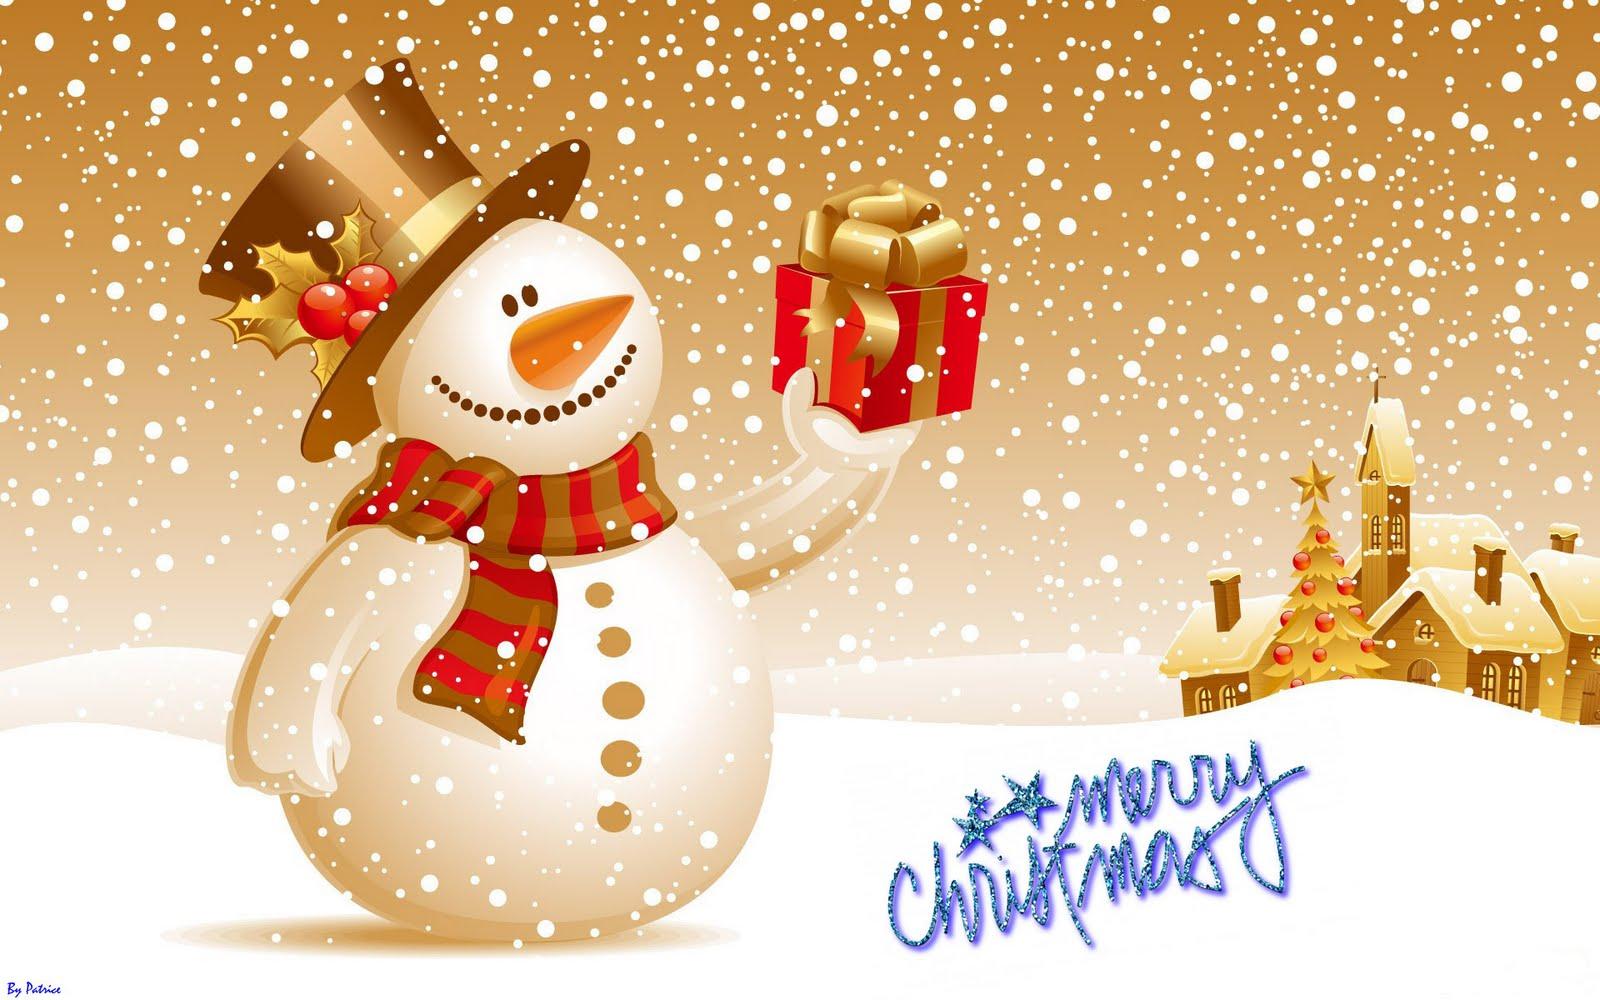 Merry christmas wallpapaers for desktop free christian wallpapers